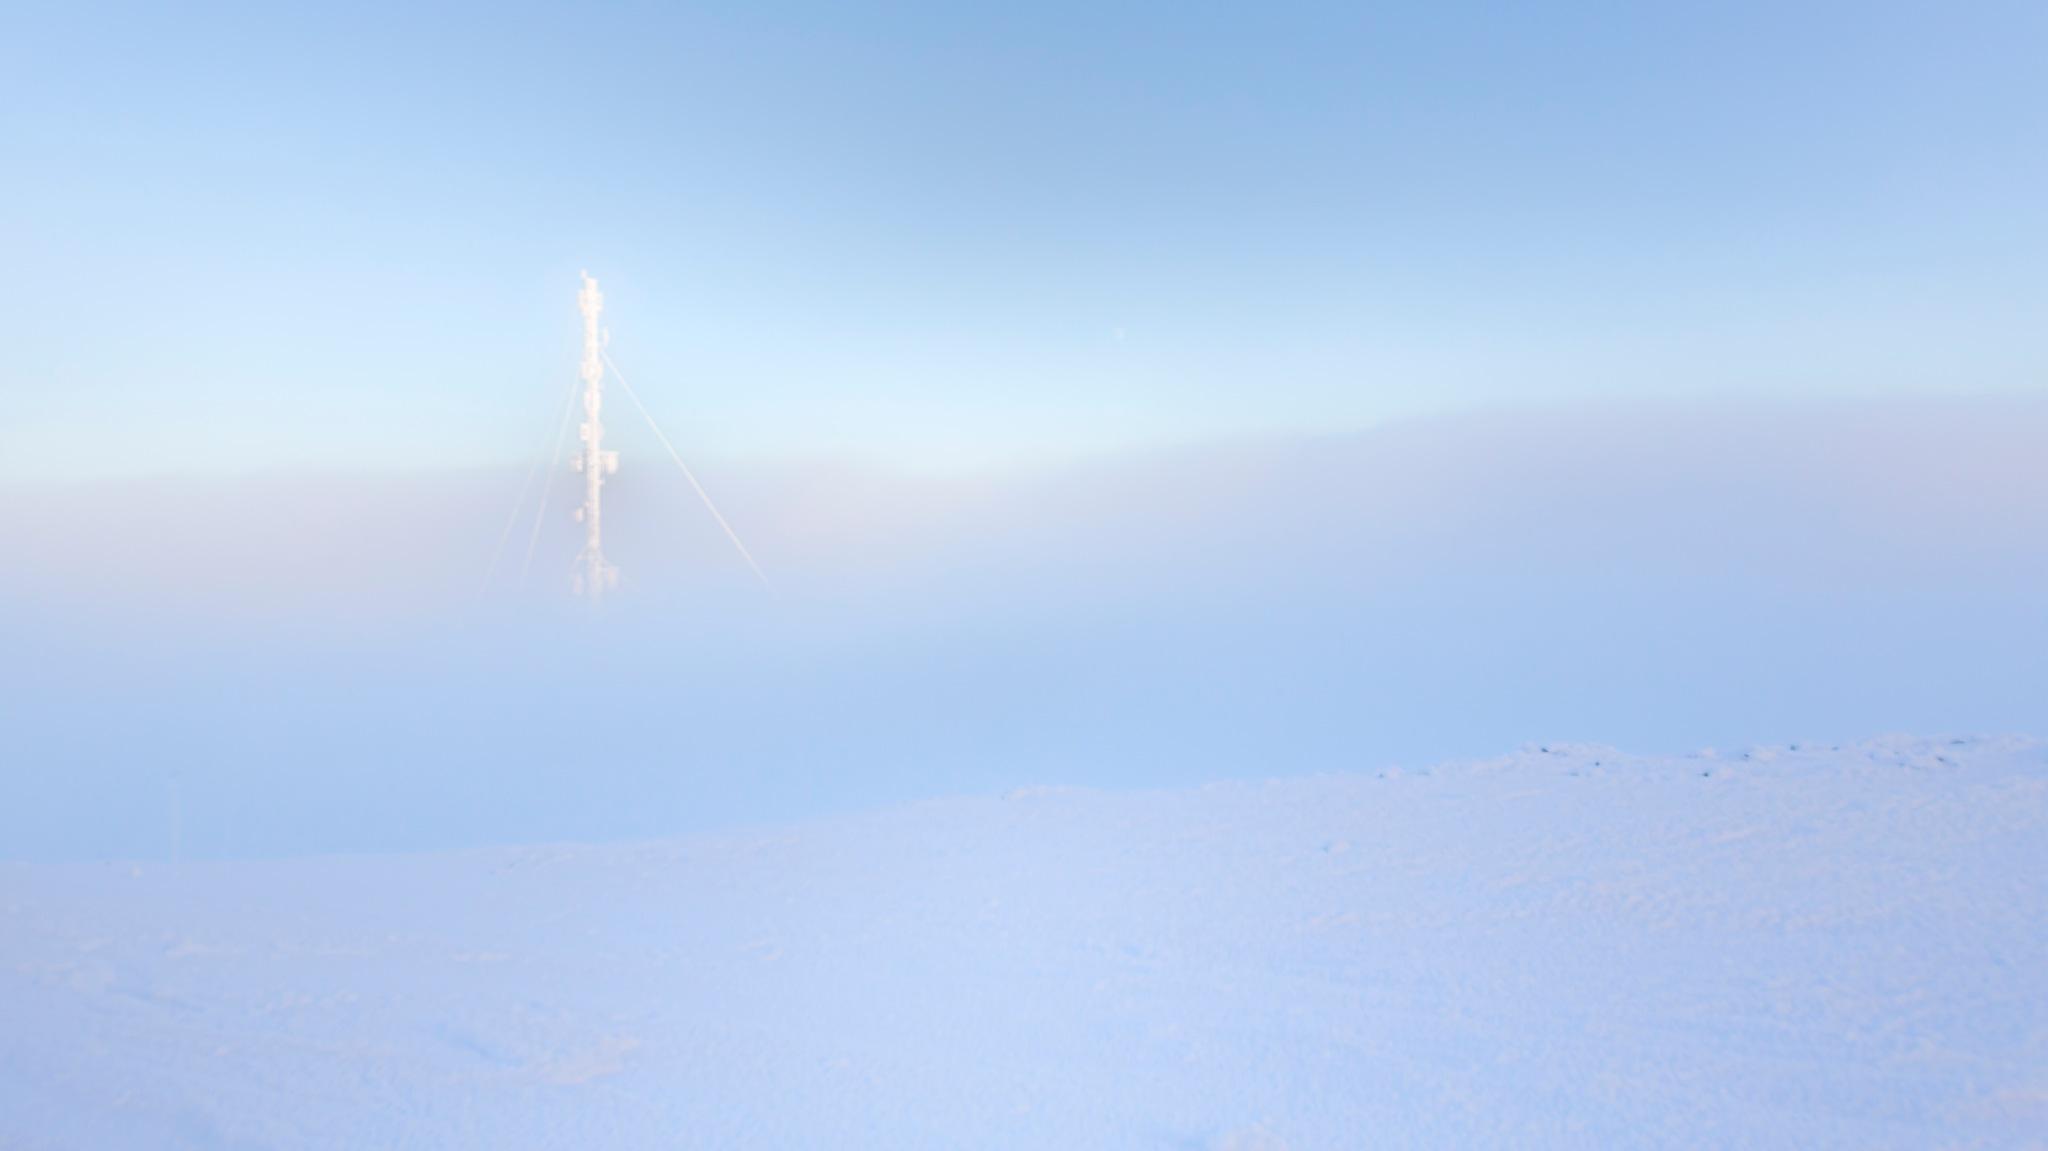 Between arctic clouds by FerdinandMul